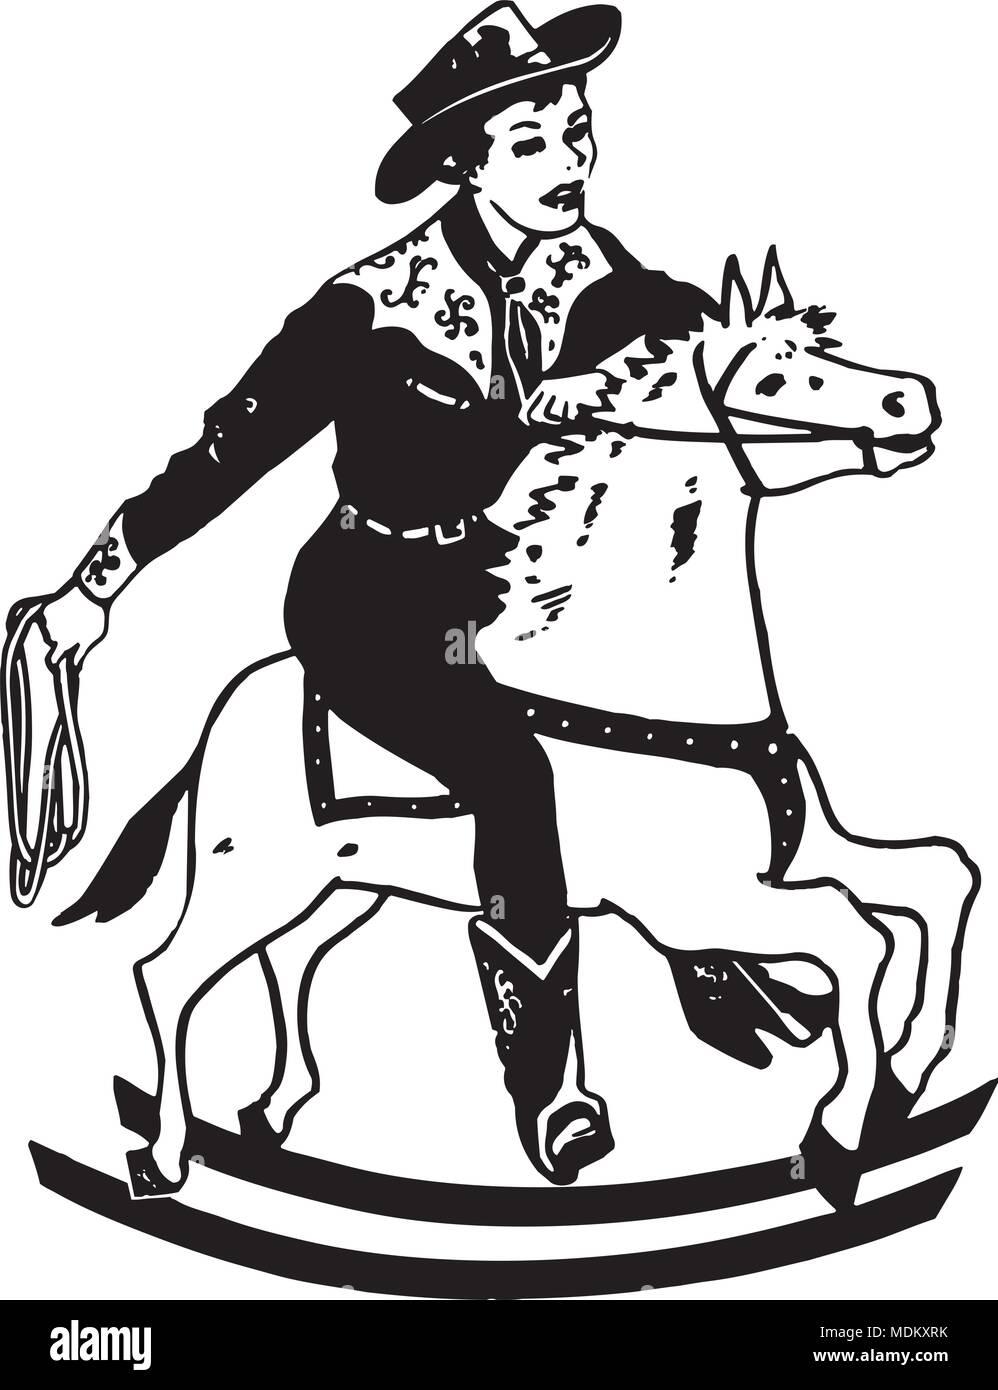 hight resolution of boy on rocking horse retro clipart illustration